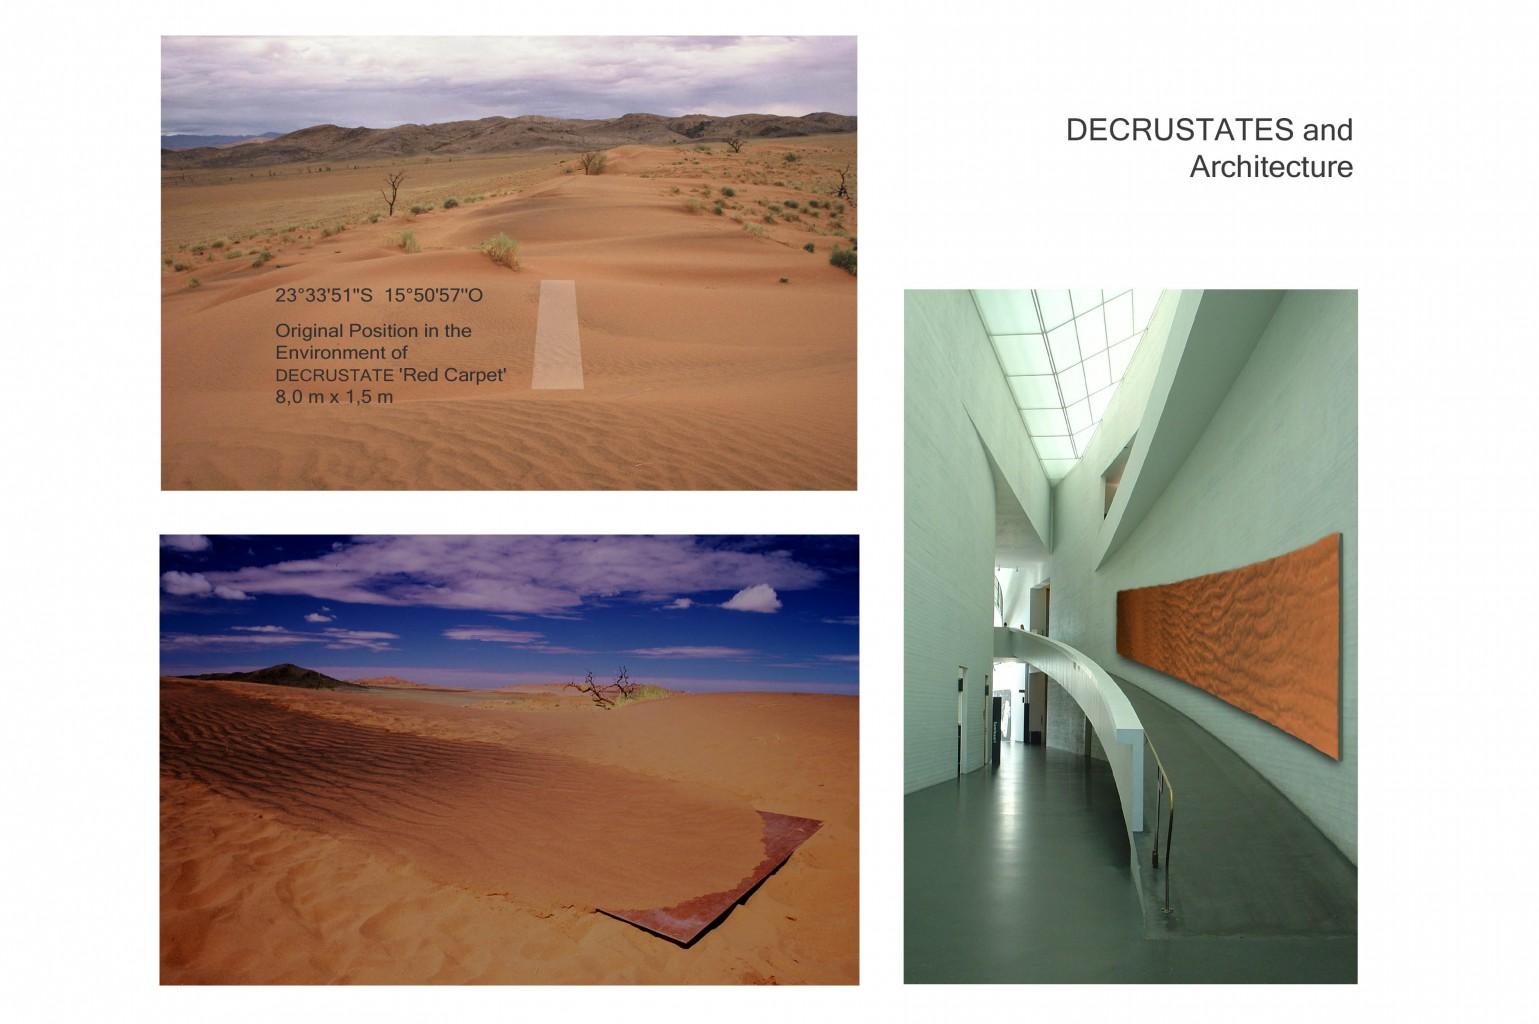 DECRUSTATES and Architecture 1 Kopie